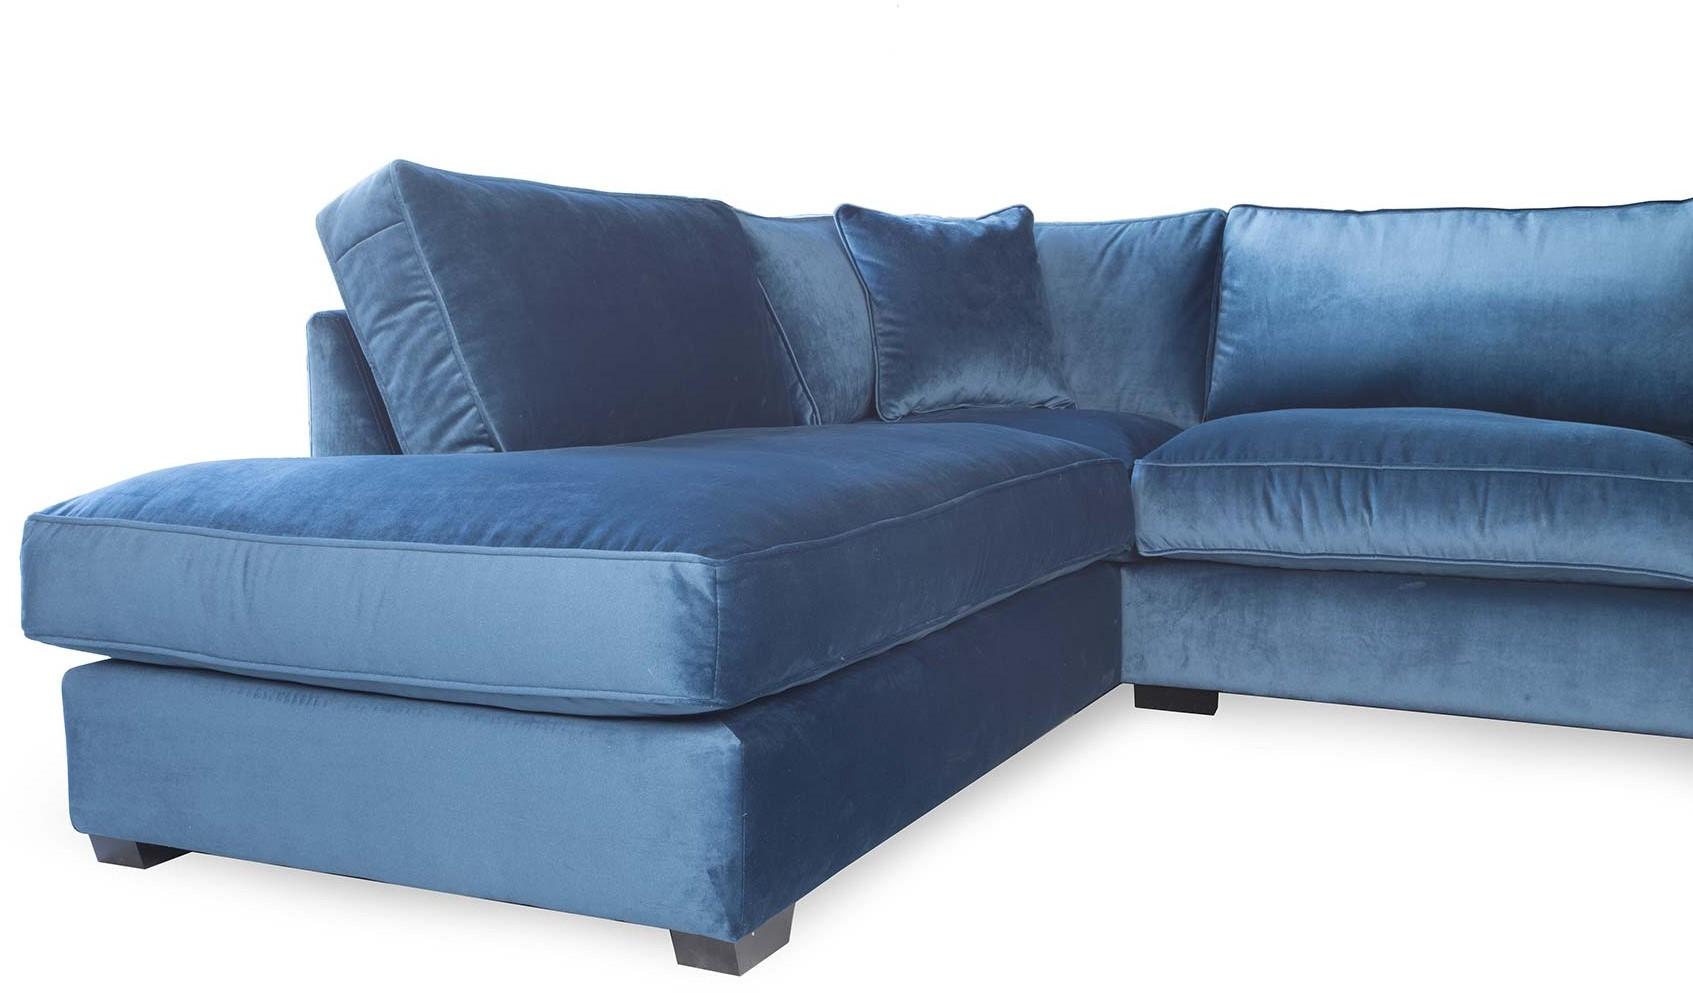 Peachy Sofa 3S Amazon Ottoman L Juke Blue Dailytribune Chair Design For Home Dailytribuneorg